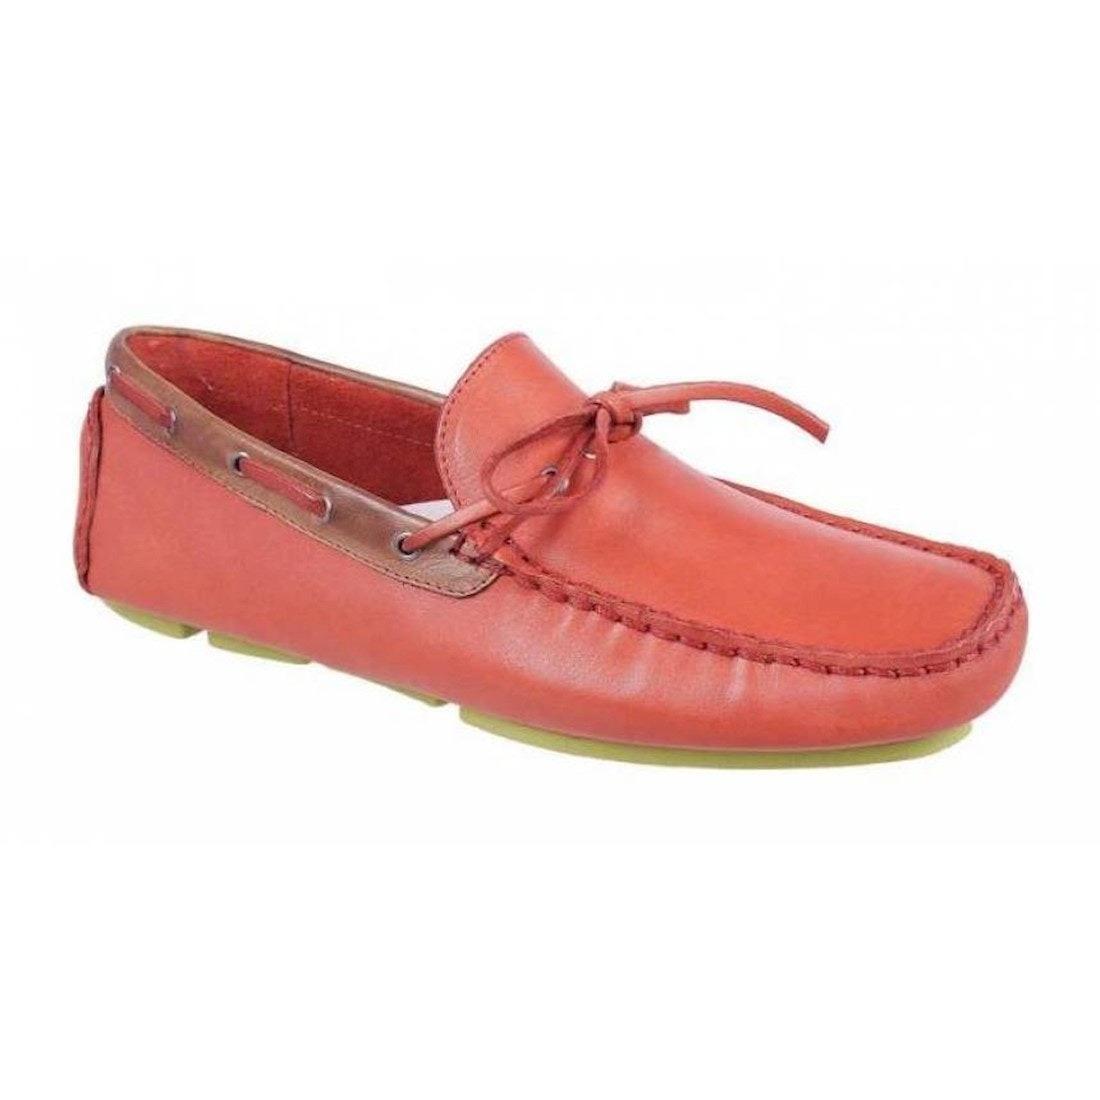 sapato masculino driver sandro moscoloni springs vermelho. Carregando zoom. 4ad36a58f00